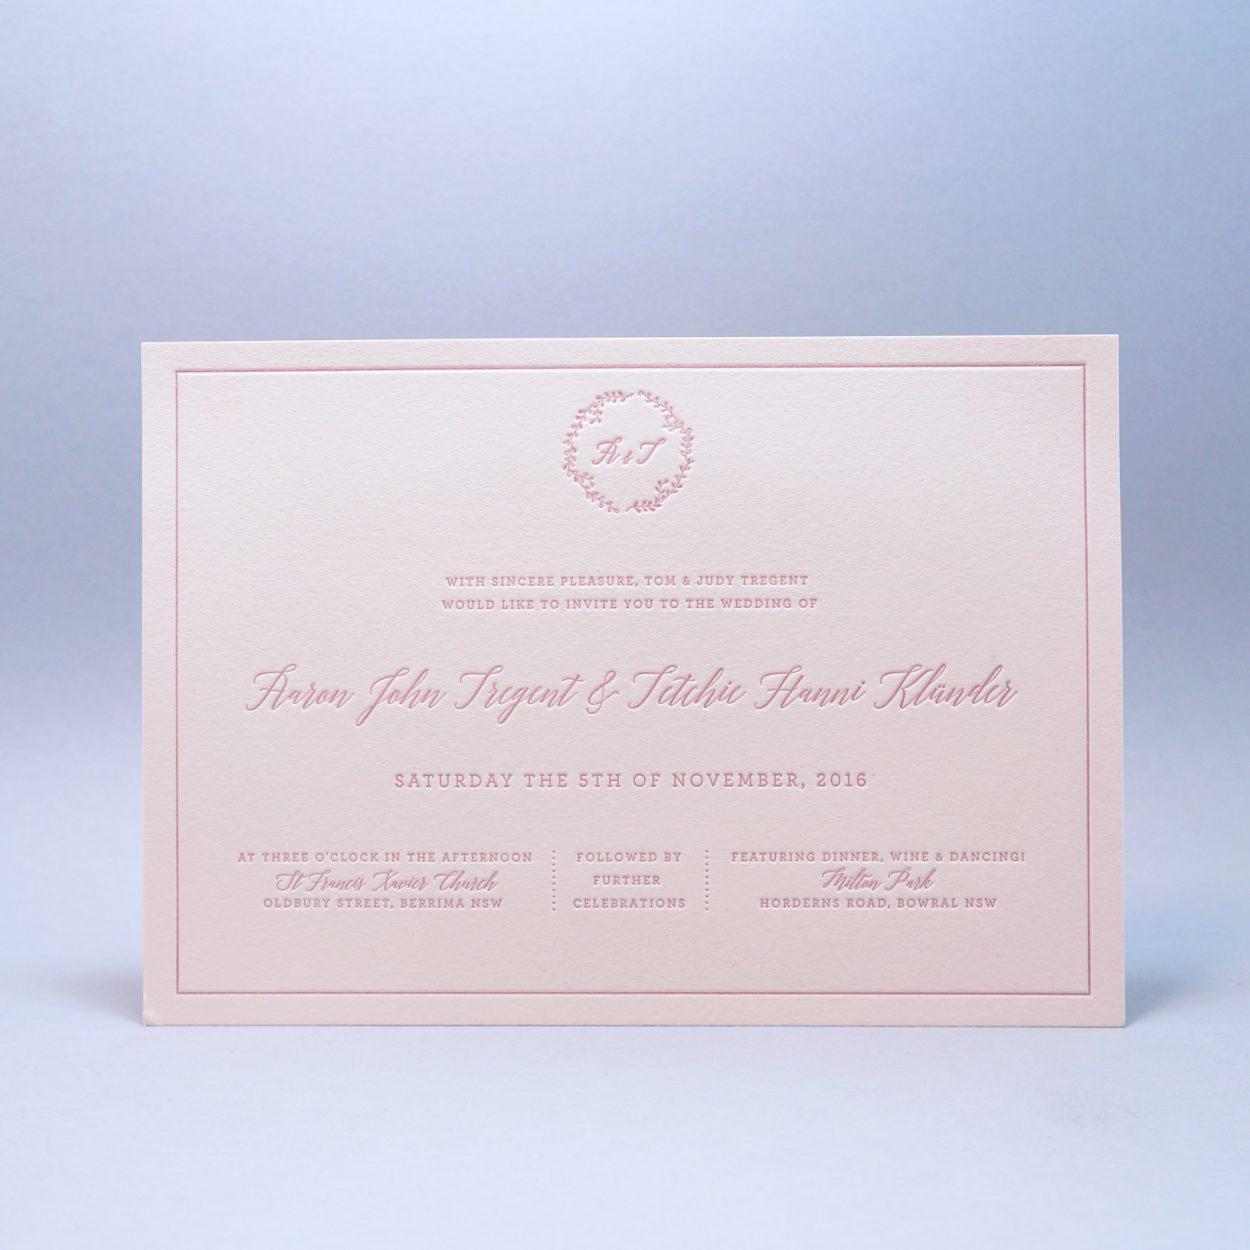 letterpress-invitations-classic-elegant-colorplan-pink-wreath